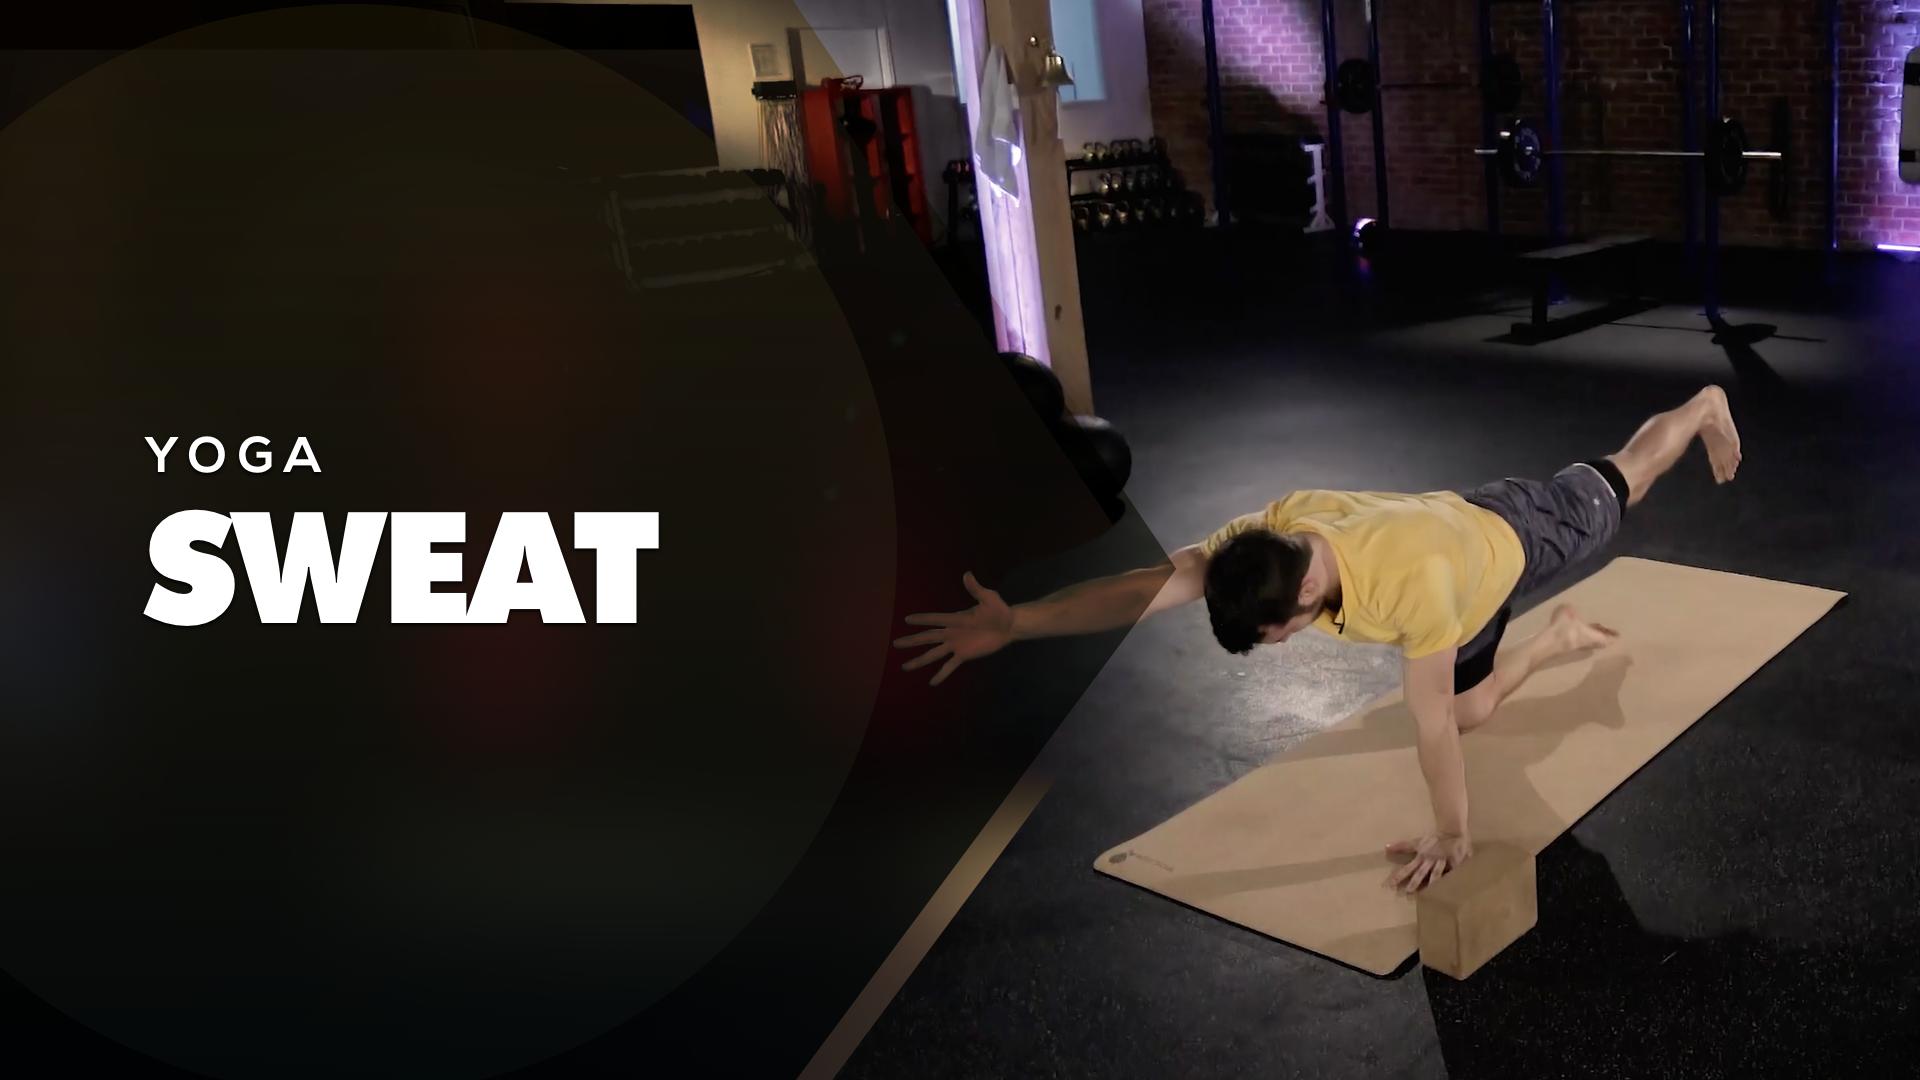 Yoga Sweat 3